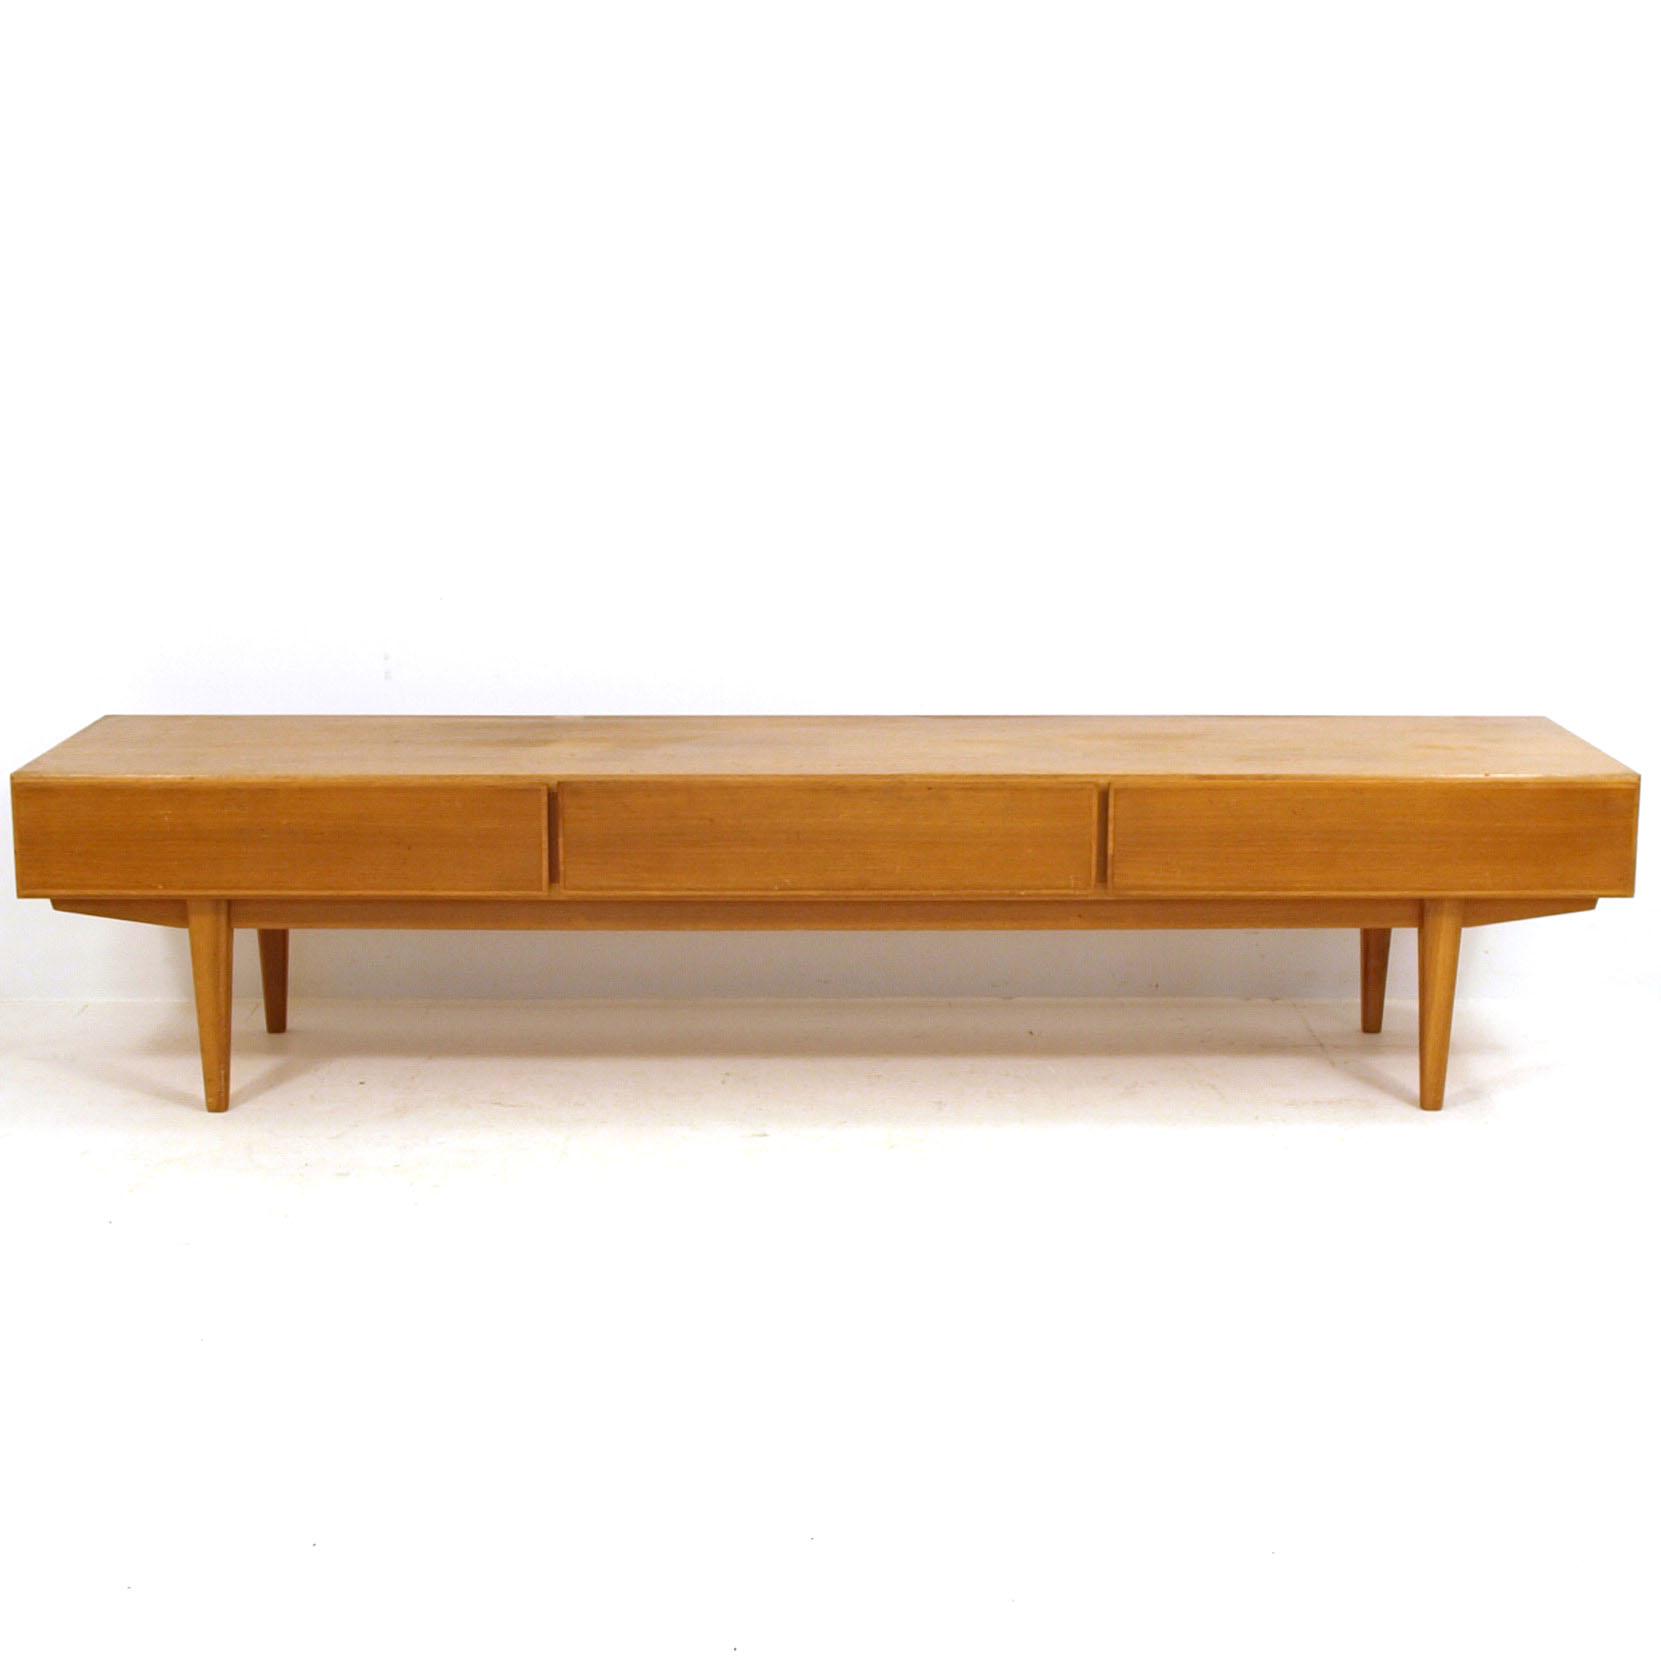 low sideboard ideal f r das heimkino m bel z rich. Black Bedroom Furniture Sets. Home Design Ideas